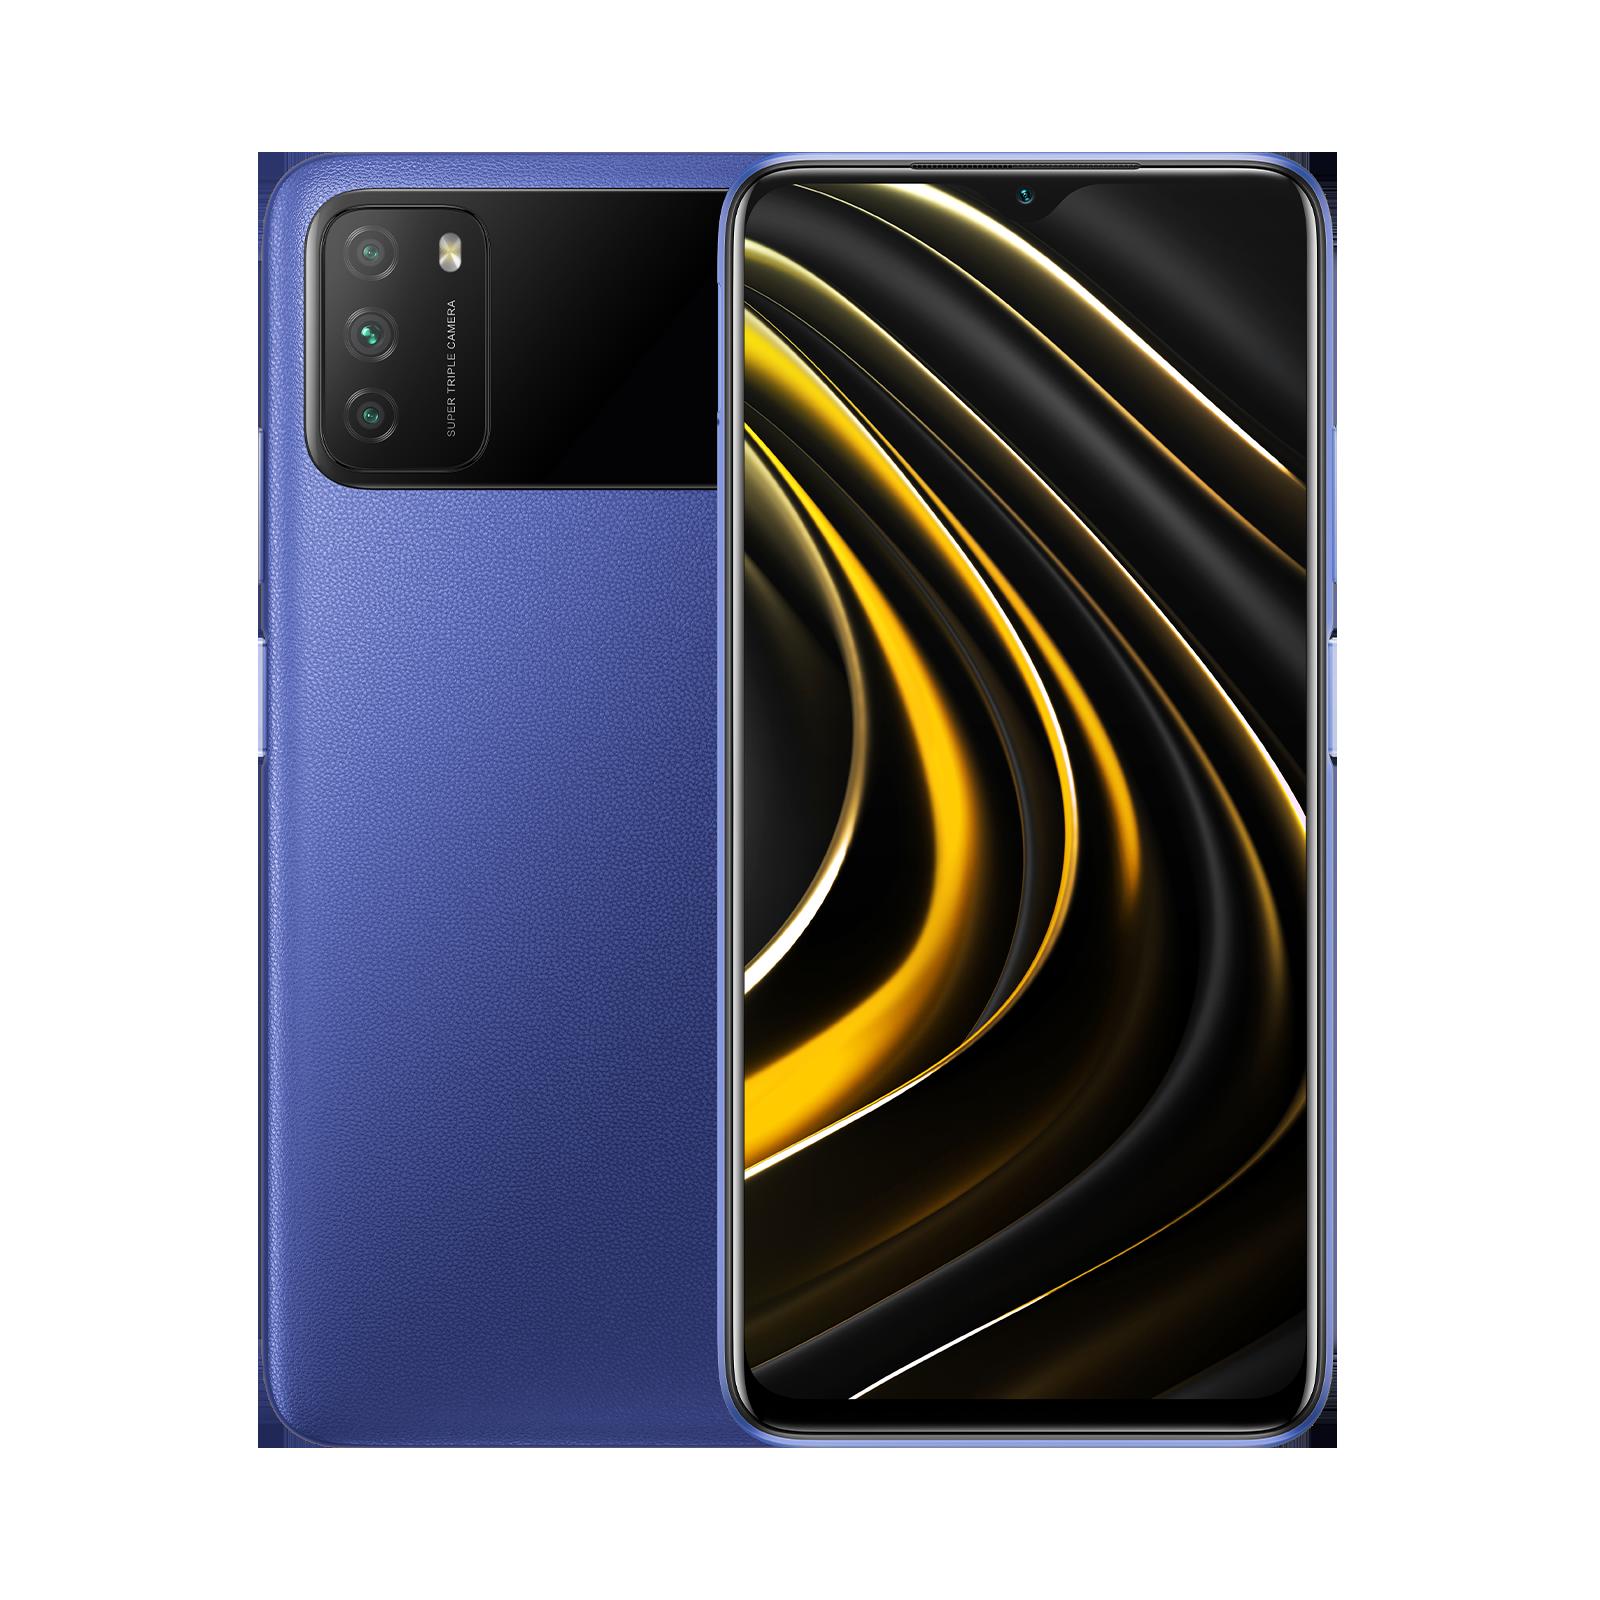 XIAOMI POCO M3 4/128GB blue - 1